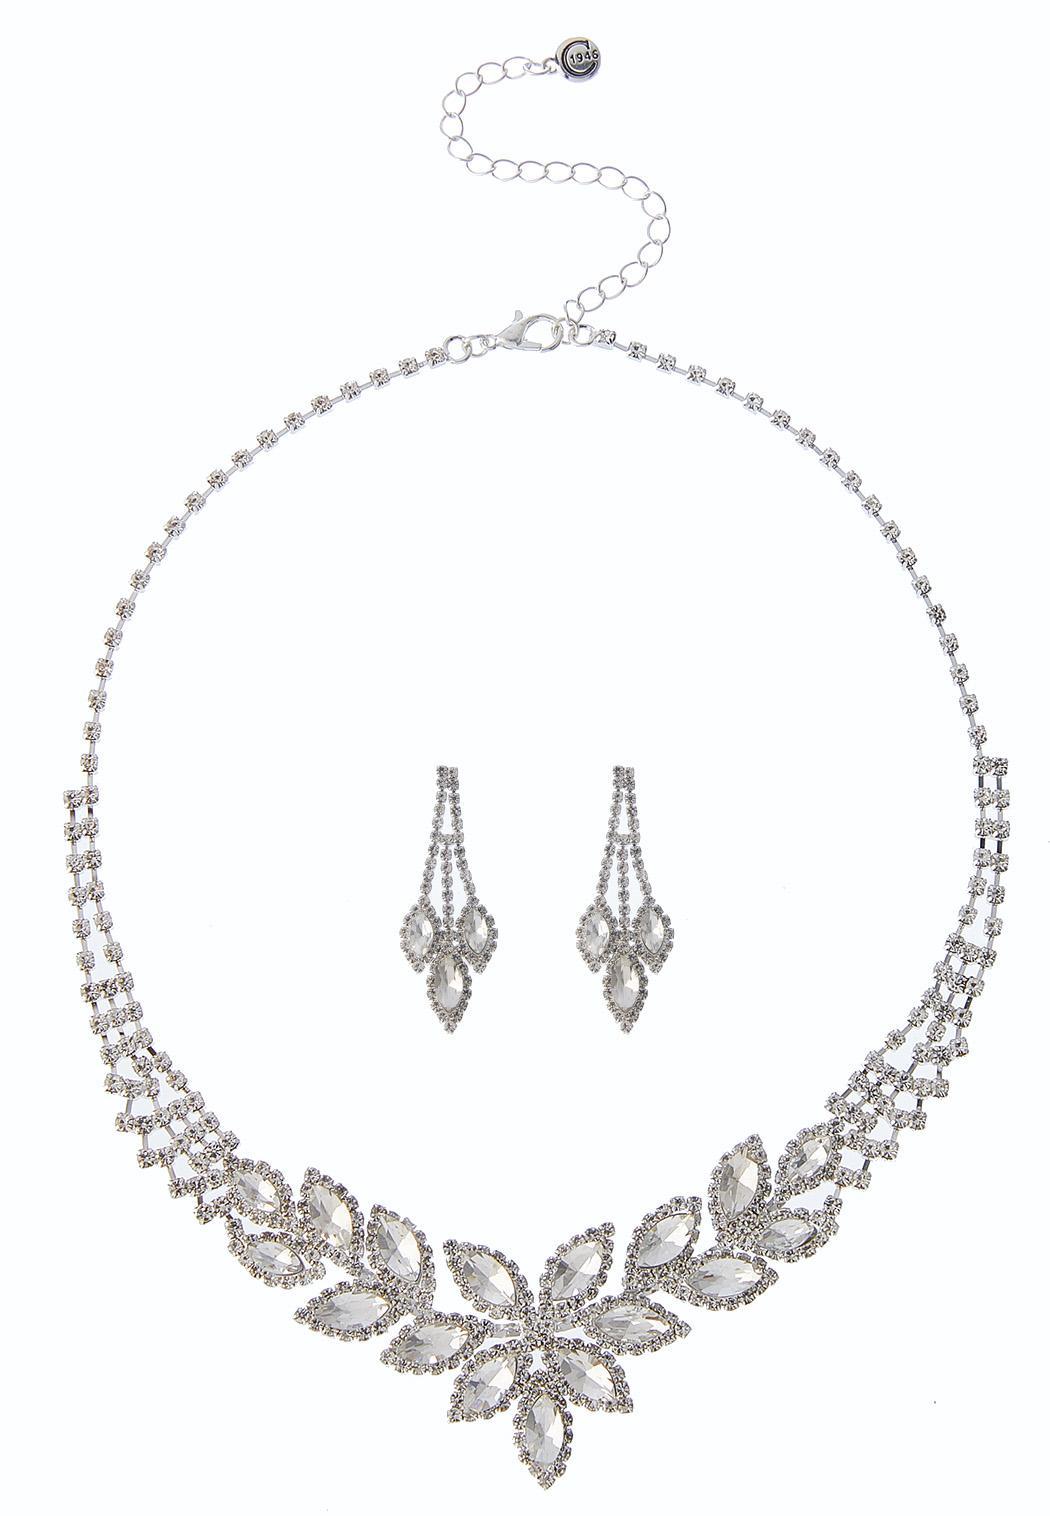 Marquis Rhinestone Necklace Set